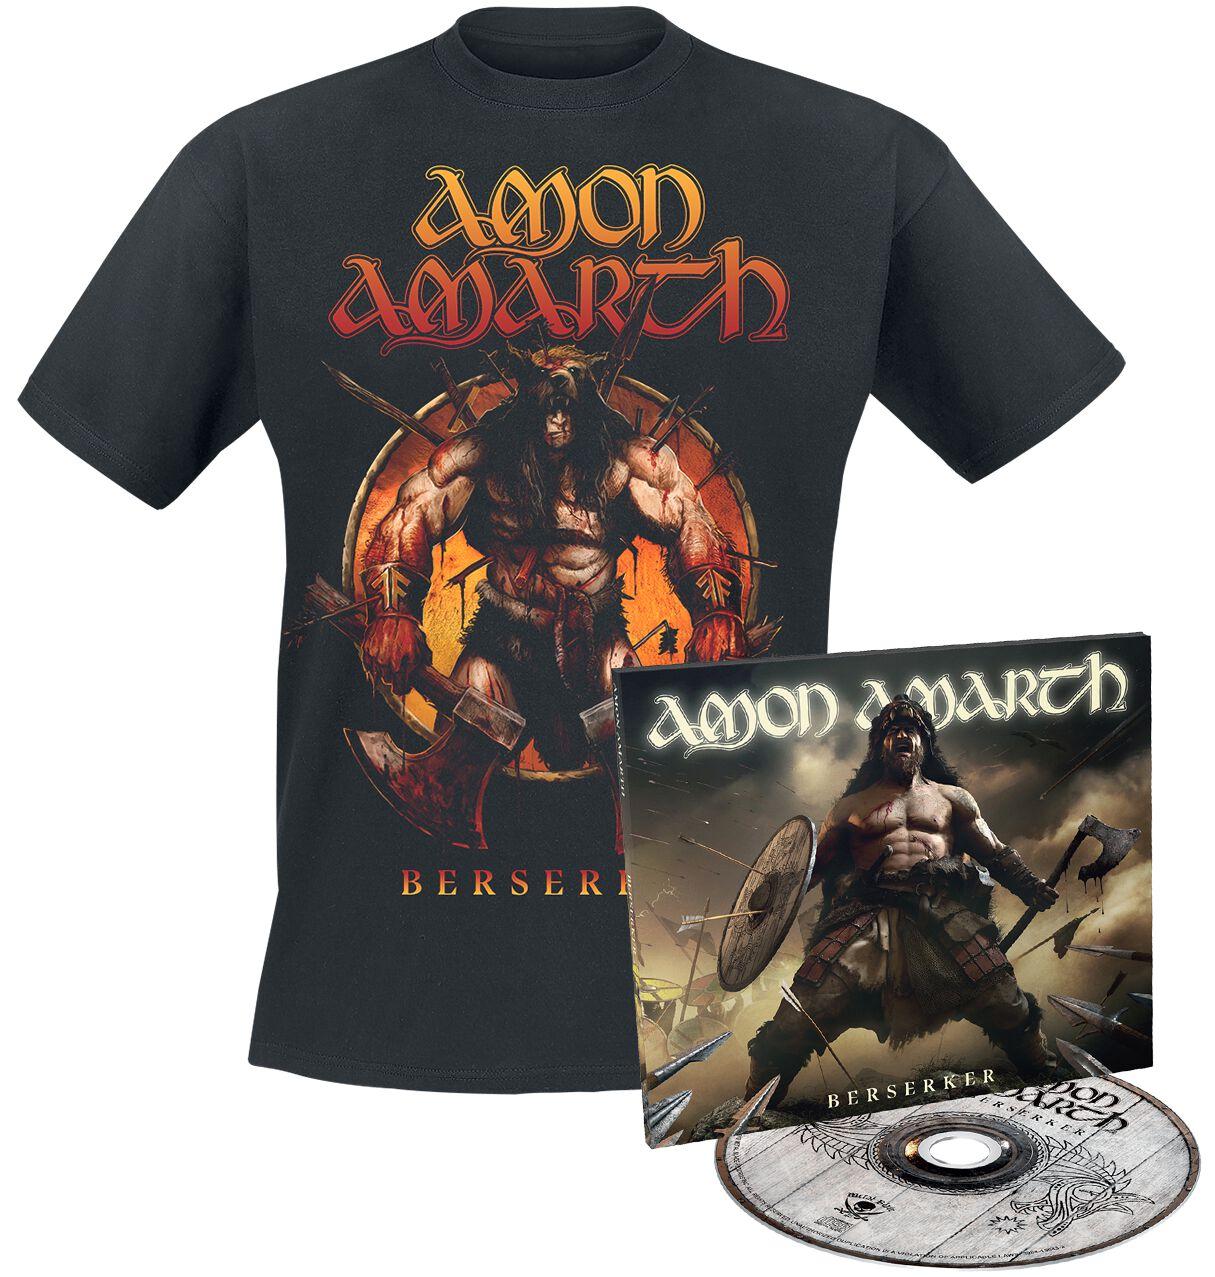 Image of Amon Amarth Berserker CD & T-Shirt Standard